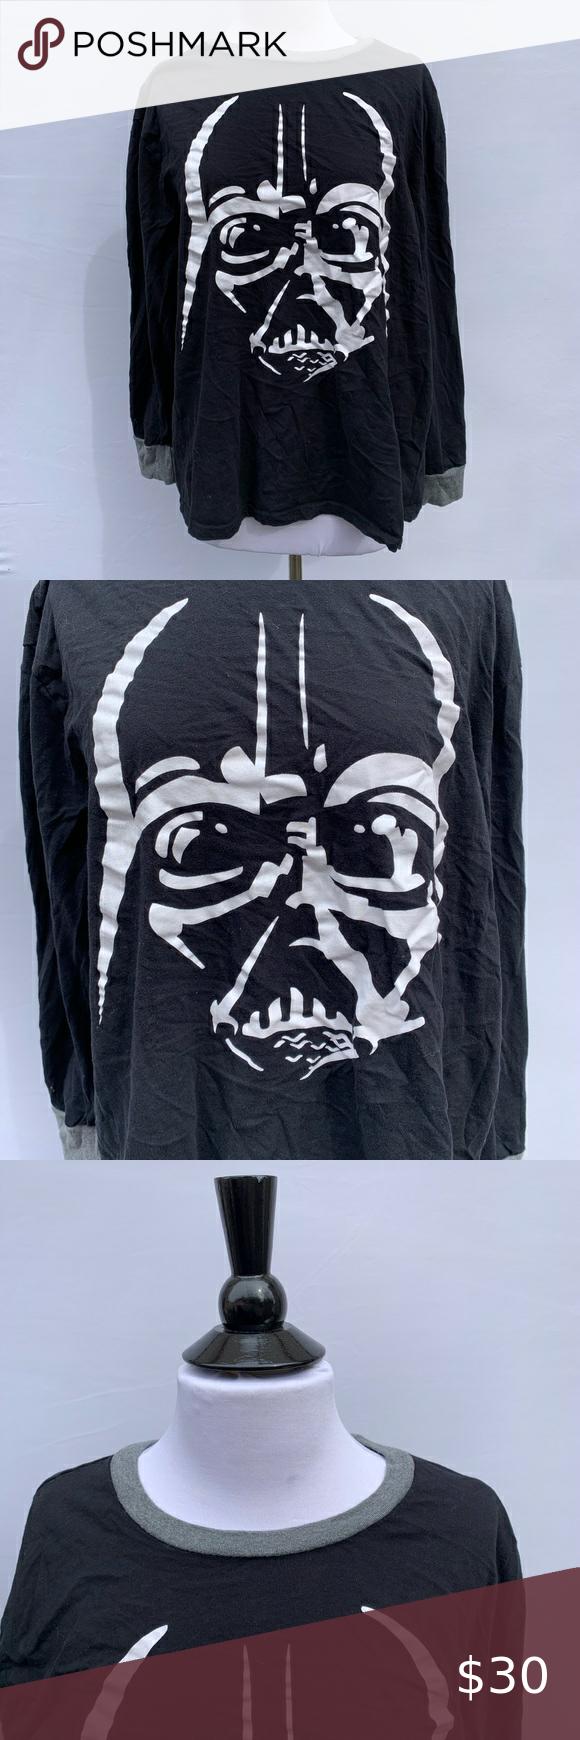 Star Wars Men S Darth Vader T Shirt Size 2x Fashion Clothes Design Fashion Trends [ 1740 x 580 Pixel ]